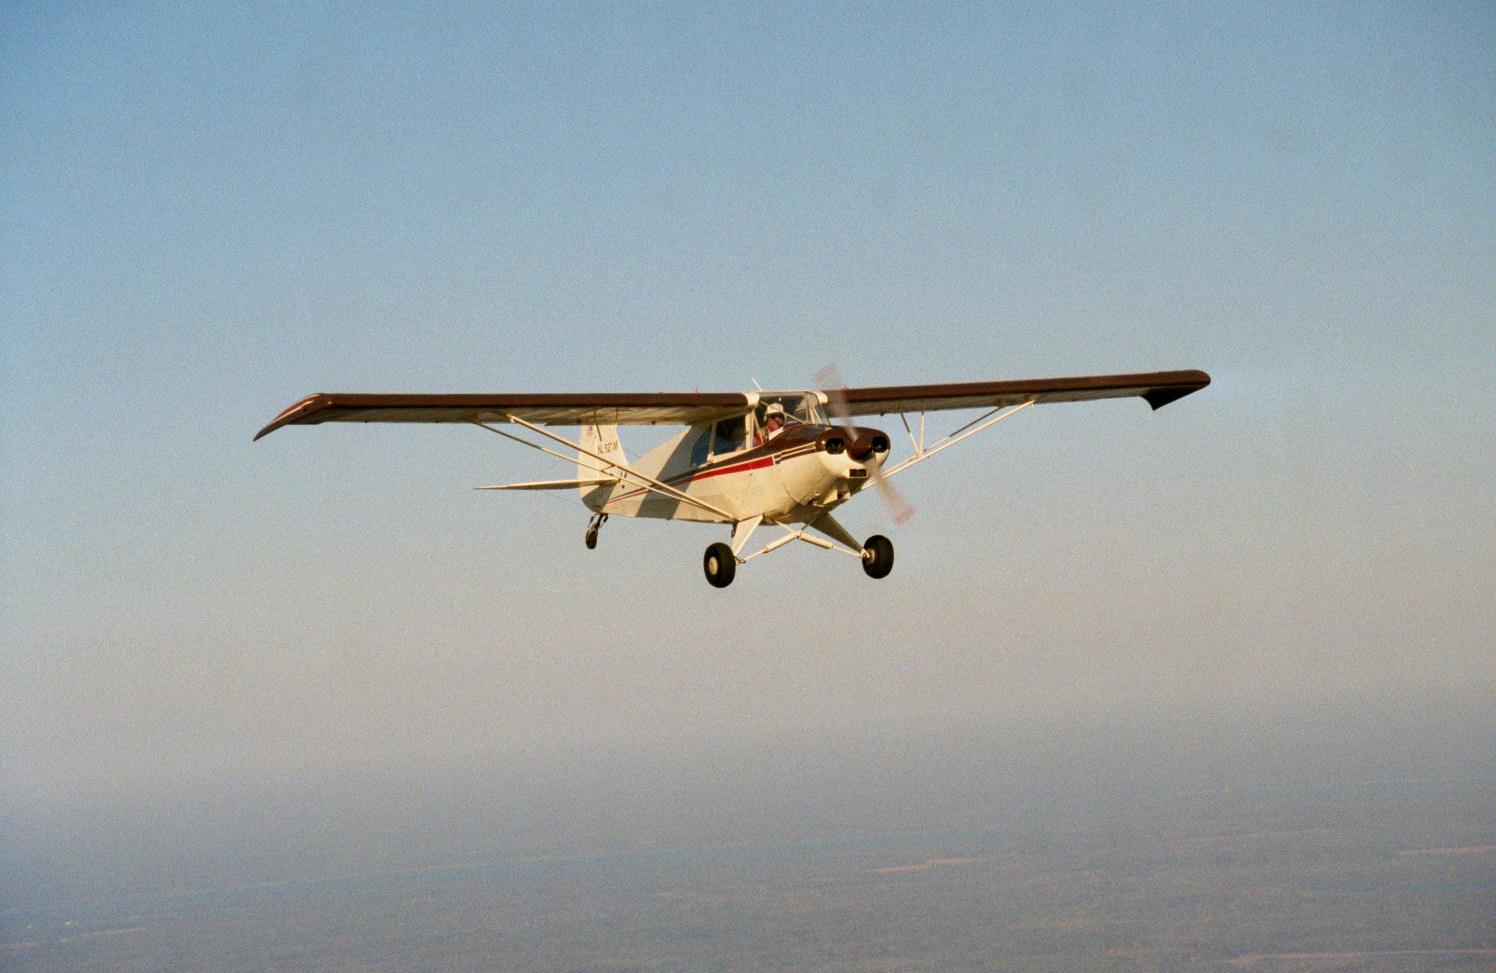 PA-12, good bad and ugly - Backcountry Pilot